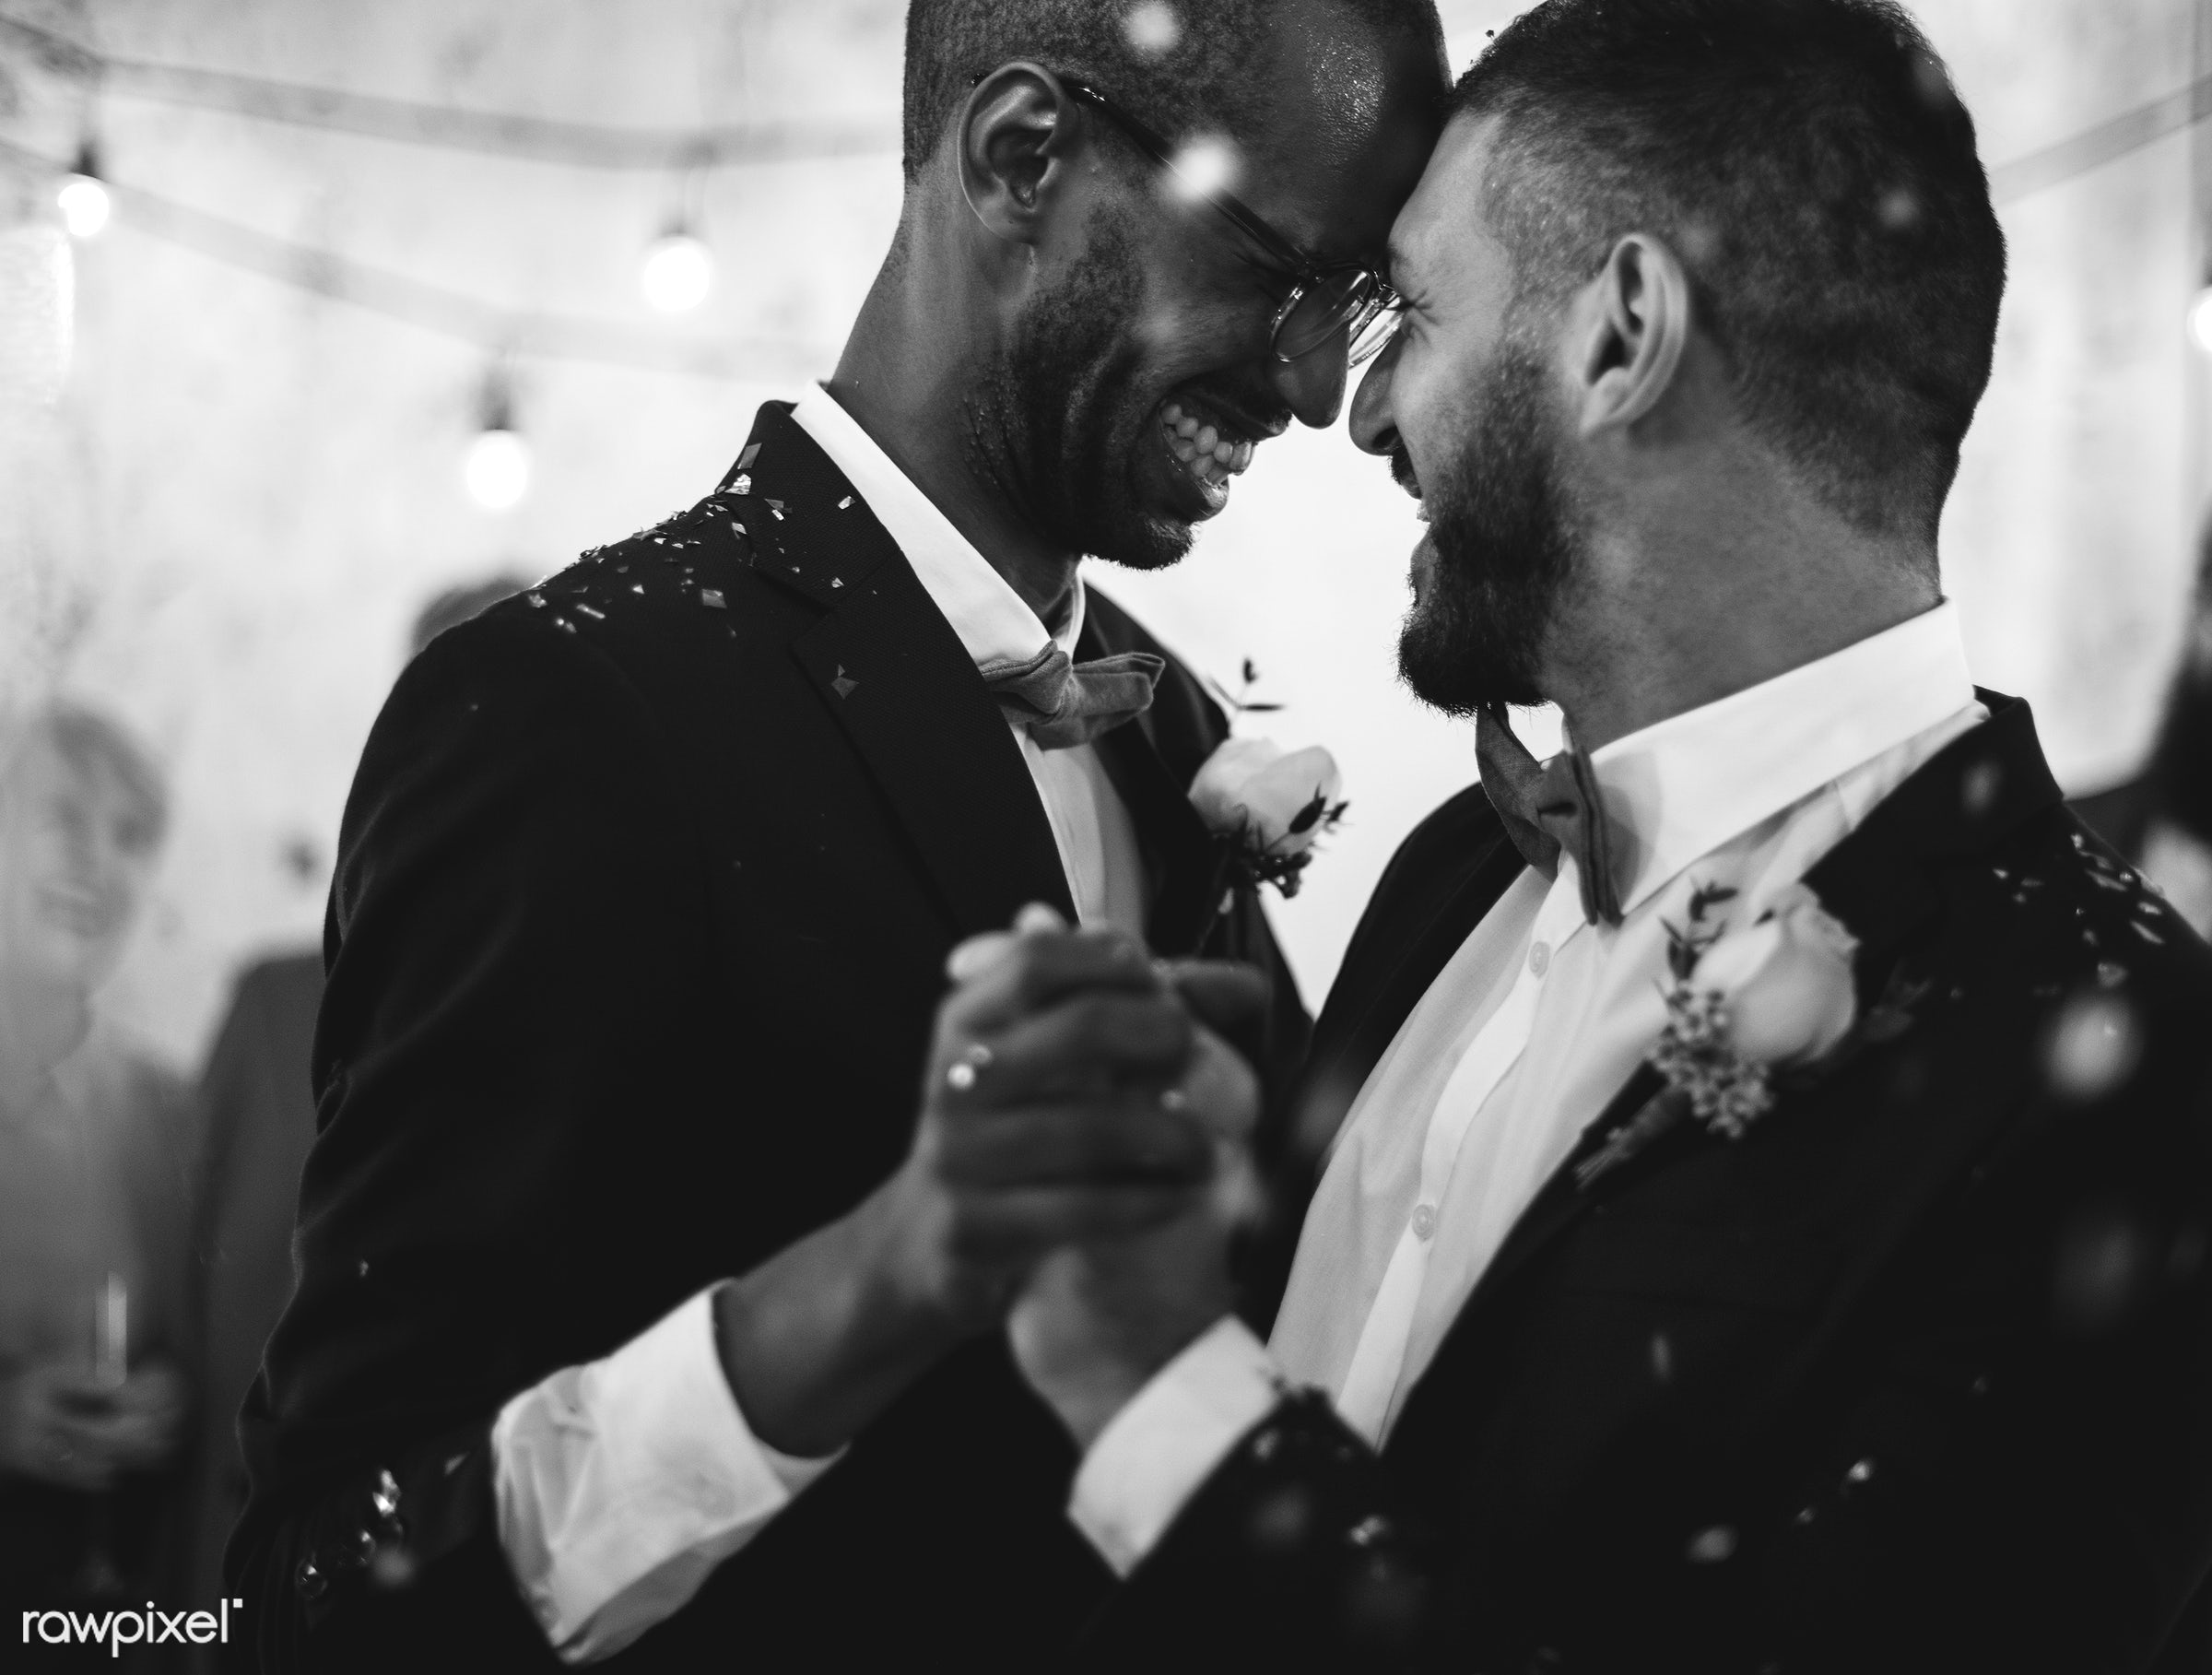 Gay couple dancing on wedding day - groom, lgbt, gay, homosexual, marriage, wedding, love, equality, sweet, closeness,...